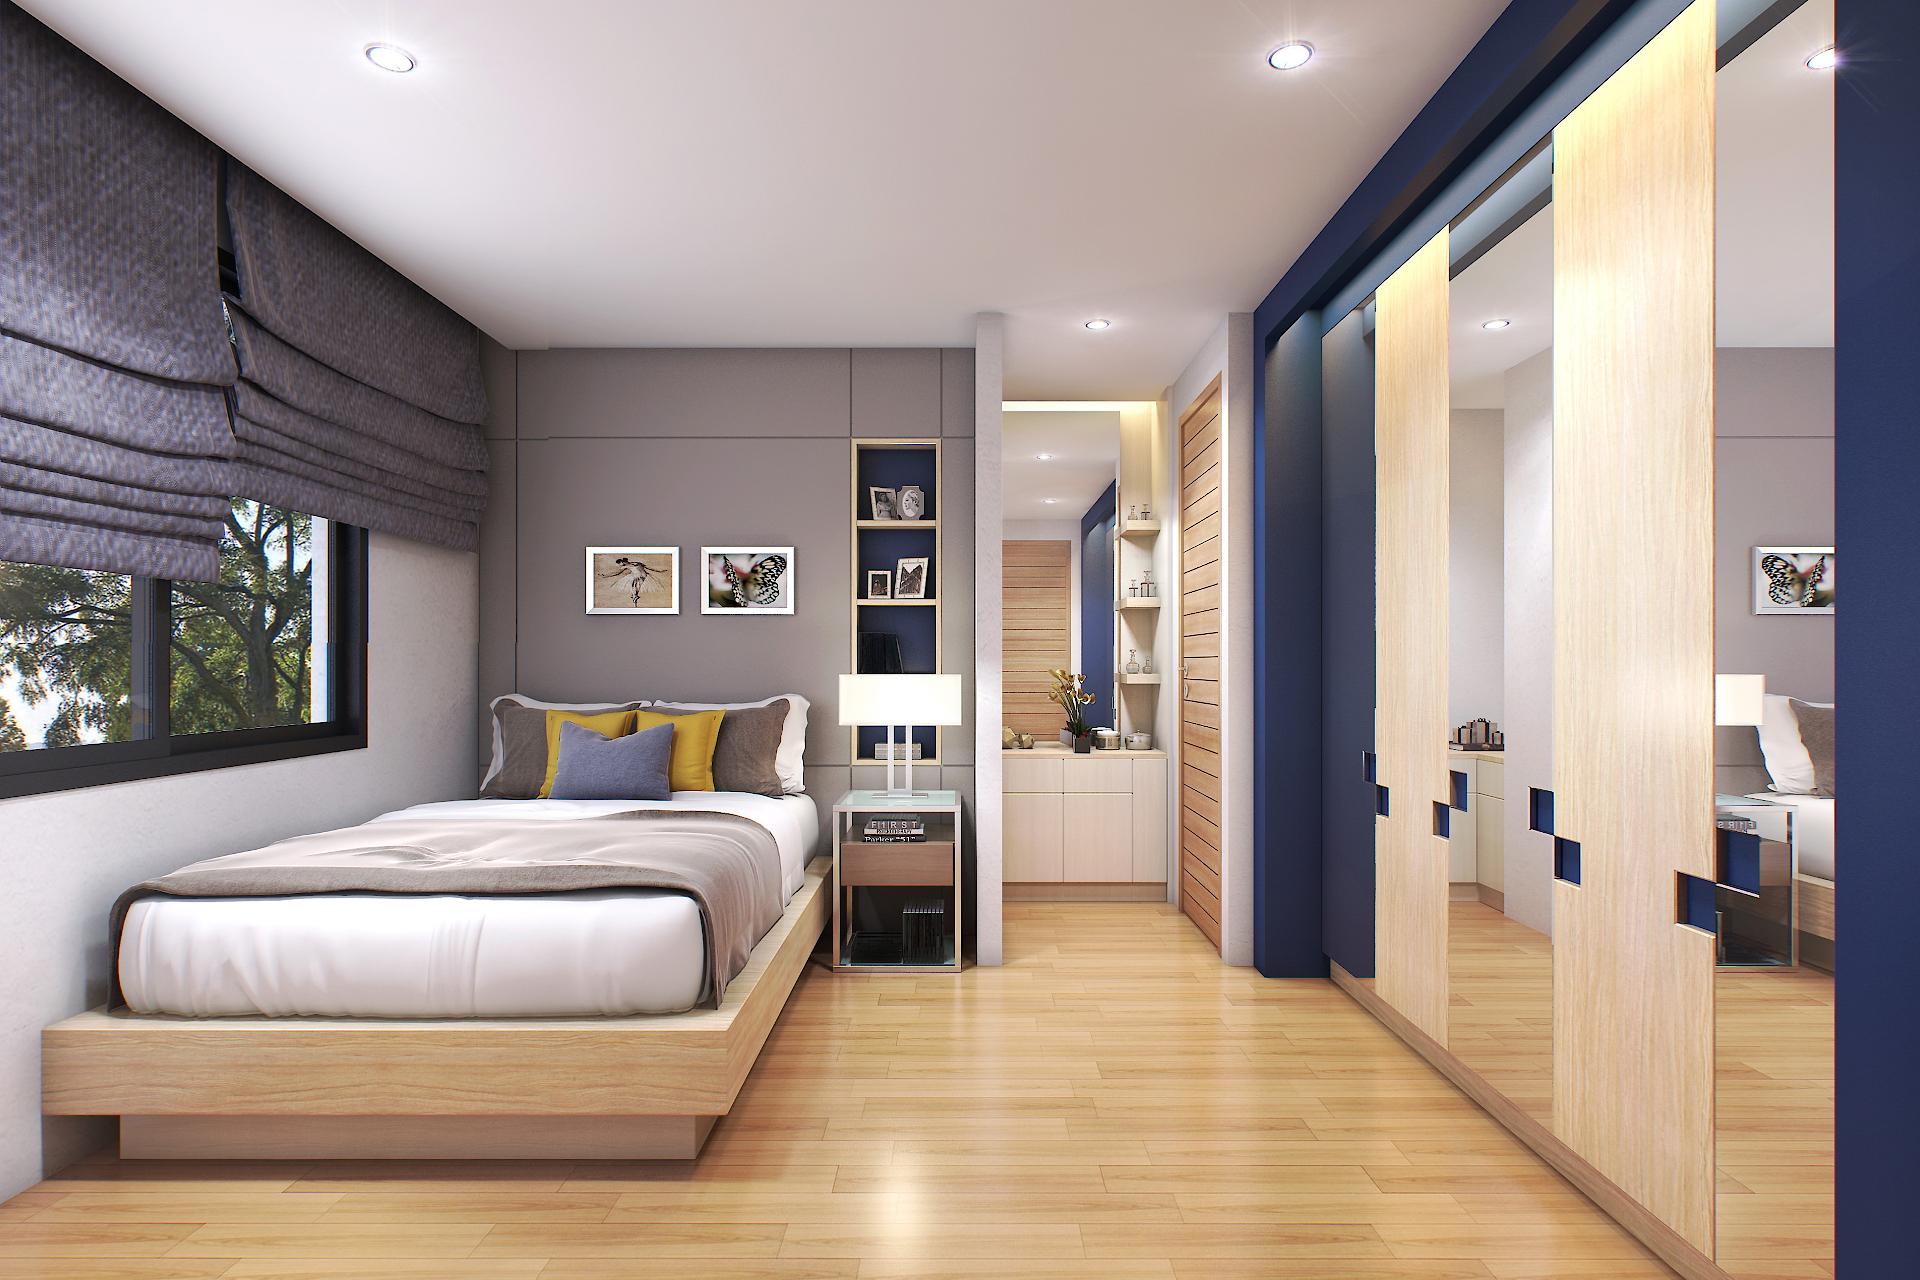 010_bedroom2.jpg